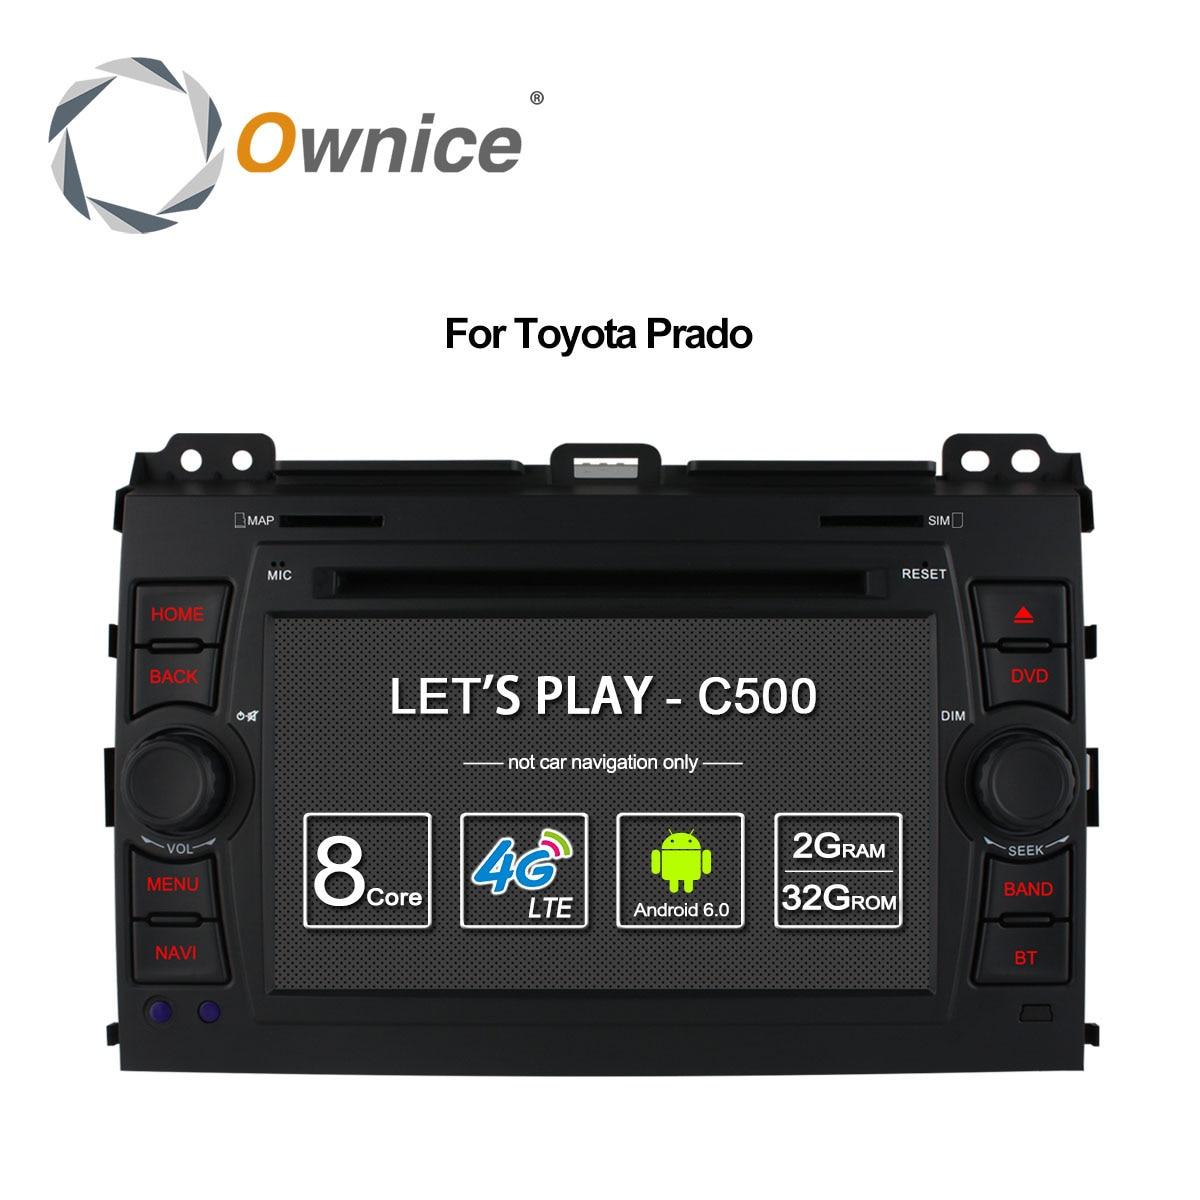 Ownice C500 4G LTE SIM Octa 8 Core Android 6.0 Car DVD Player for Toyota Land Cruiser Prado 120 2002-2009 GPS Navi Radio 32G ROM